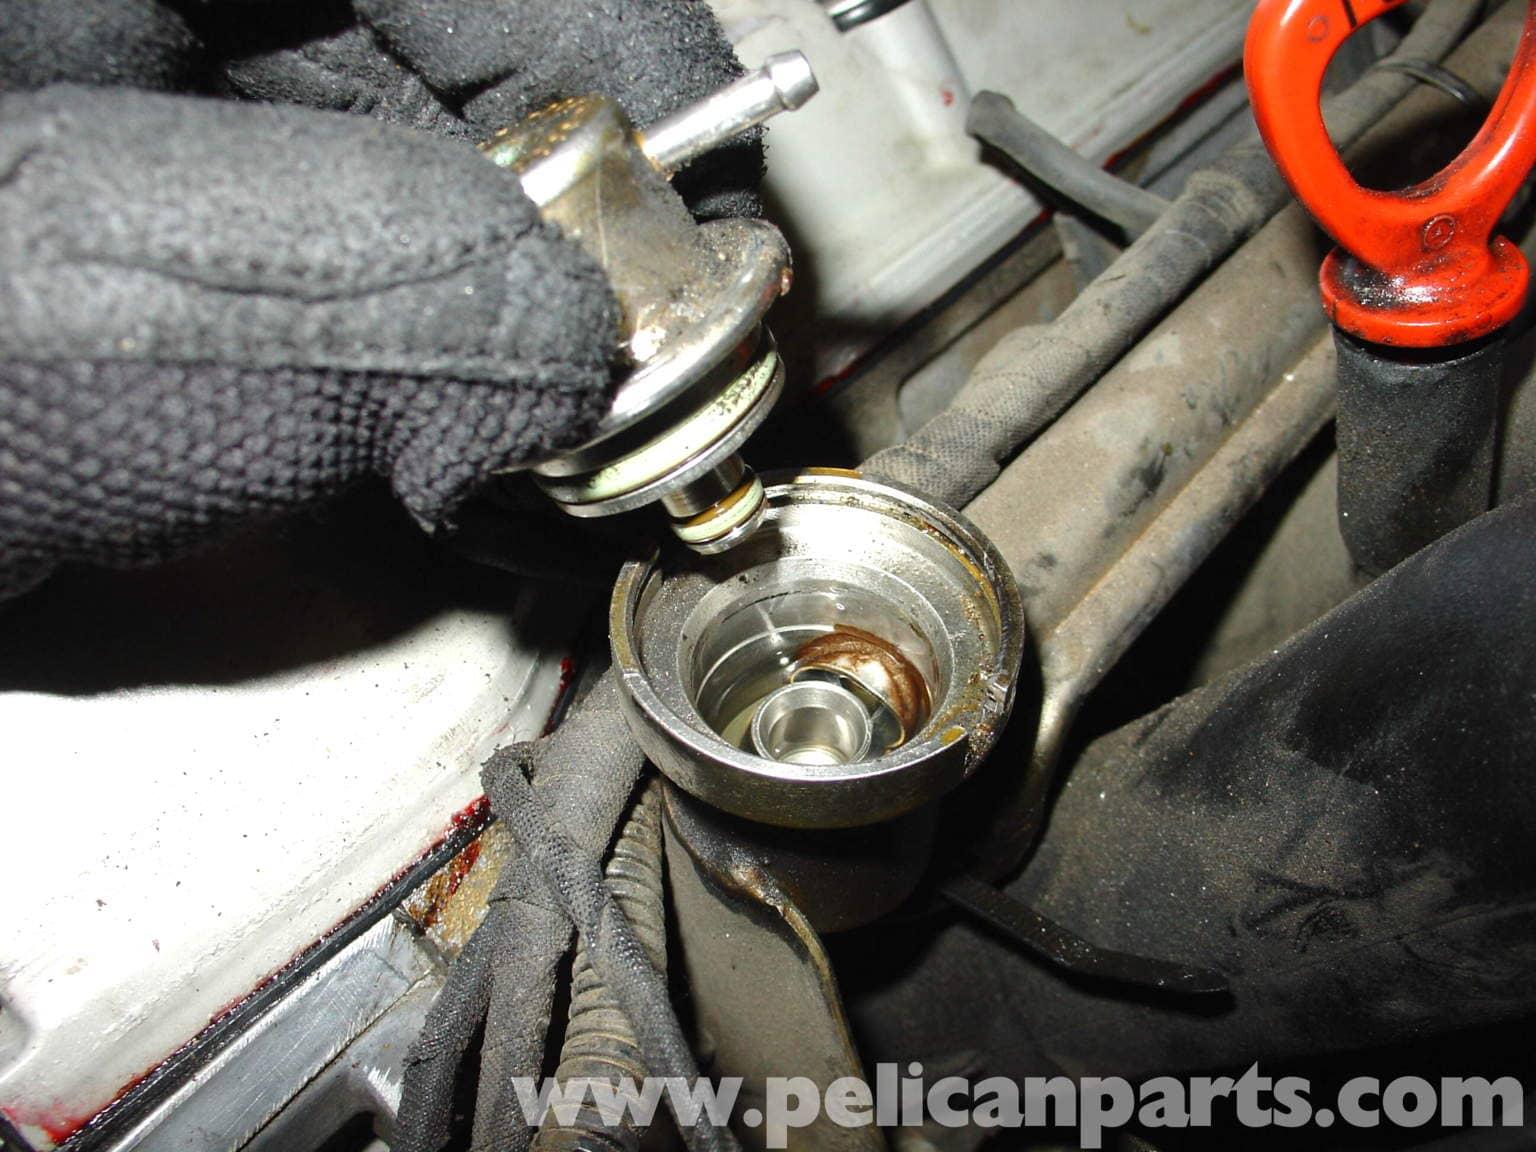 Brake Switch Wiring Diagram 1995 Chevy S 10 Mercedes Benz W210 Fuel Pressure Regulator Replacement